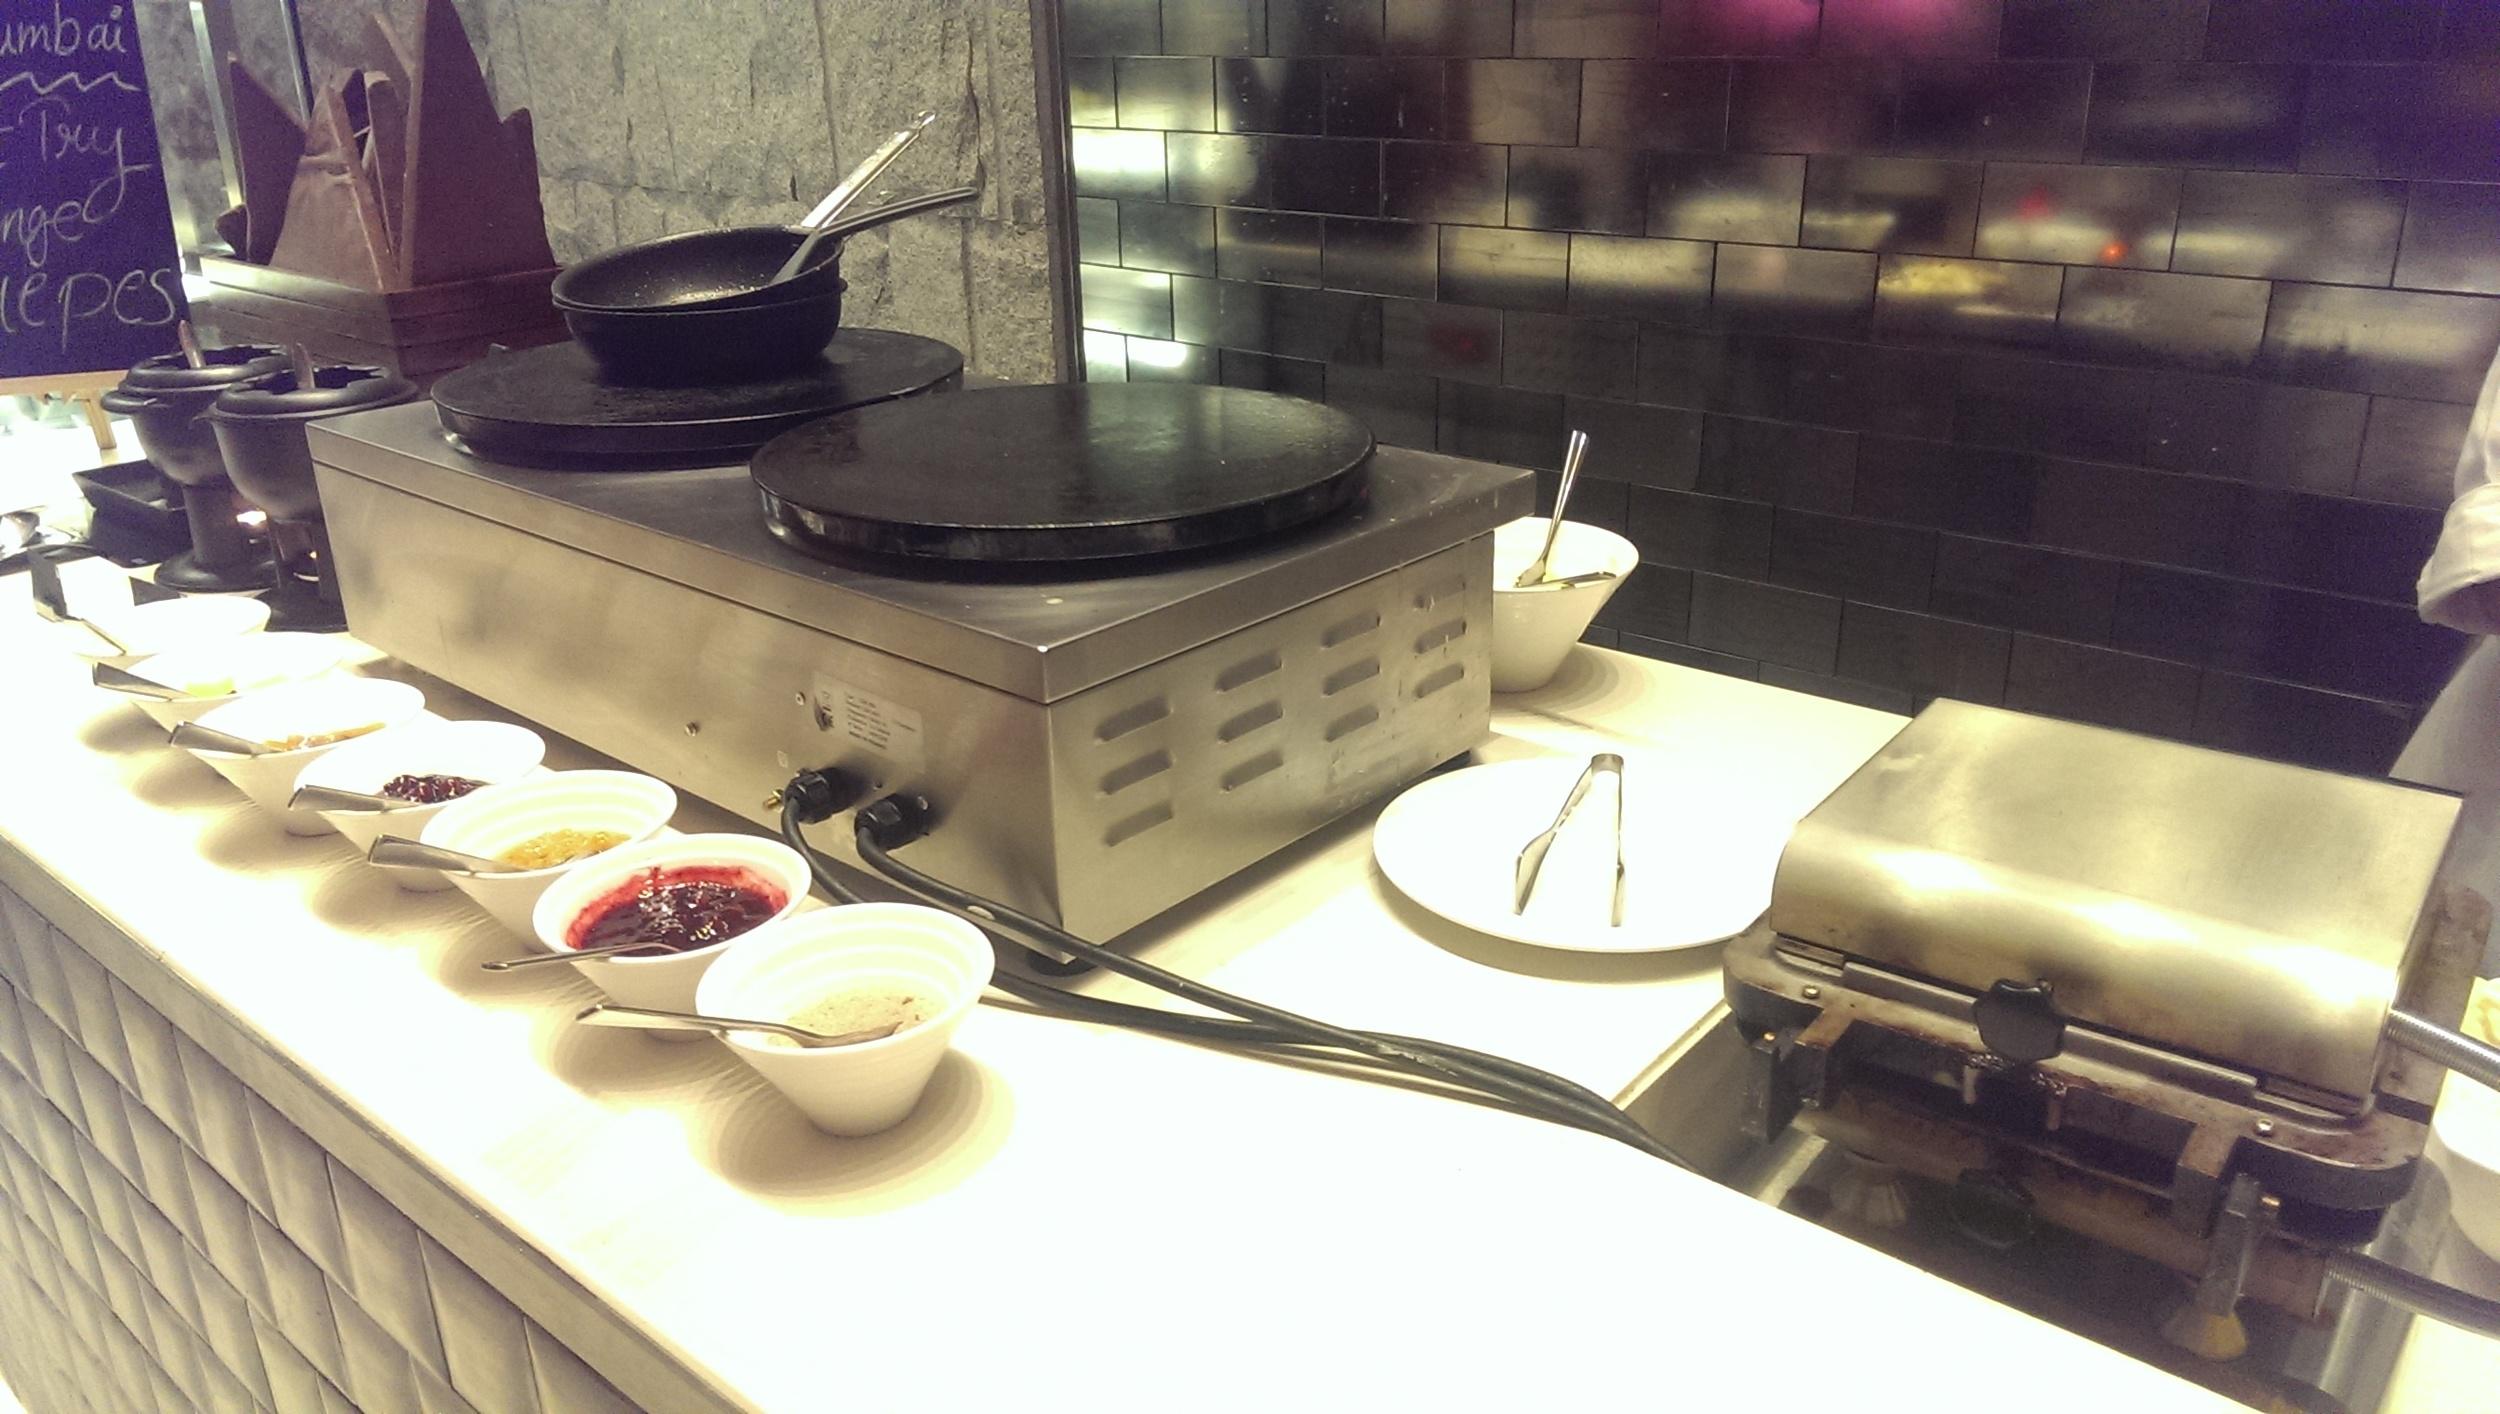 Crepe station and Waffle Iron @ JW Cafe, JW Sahar